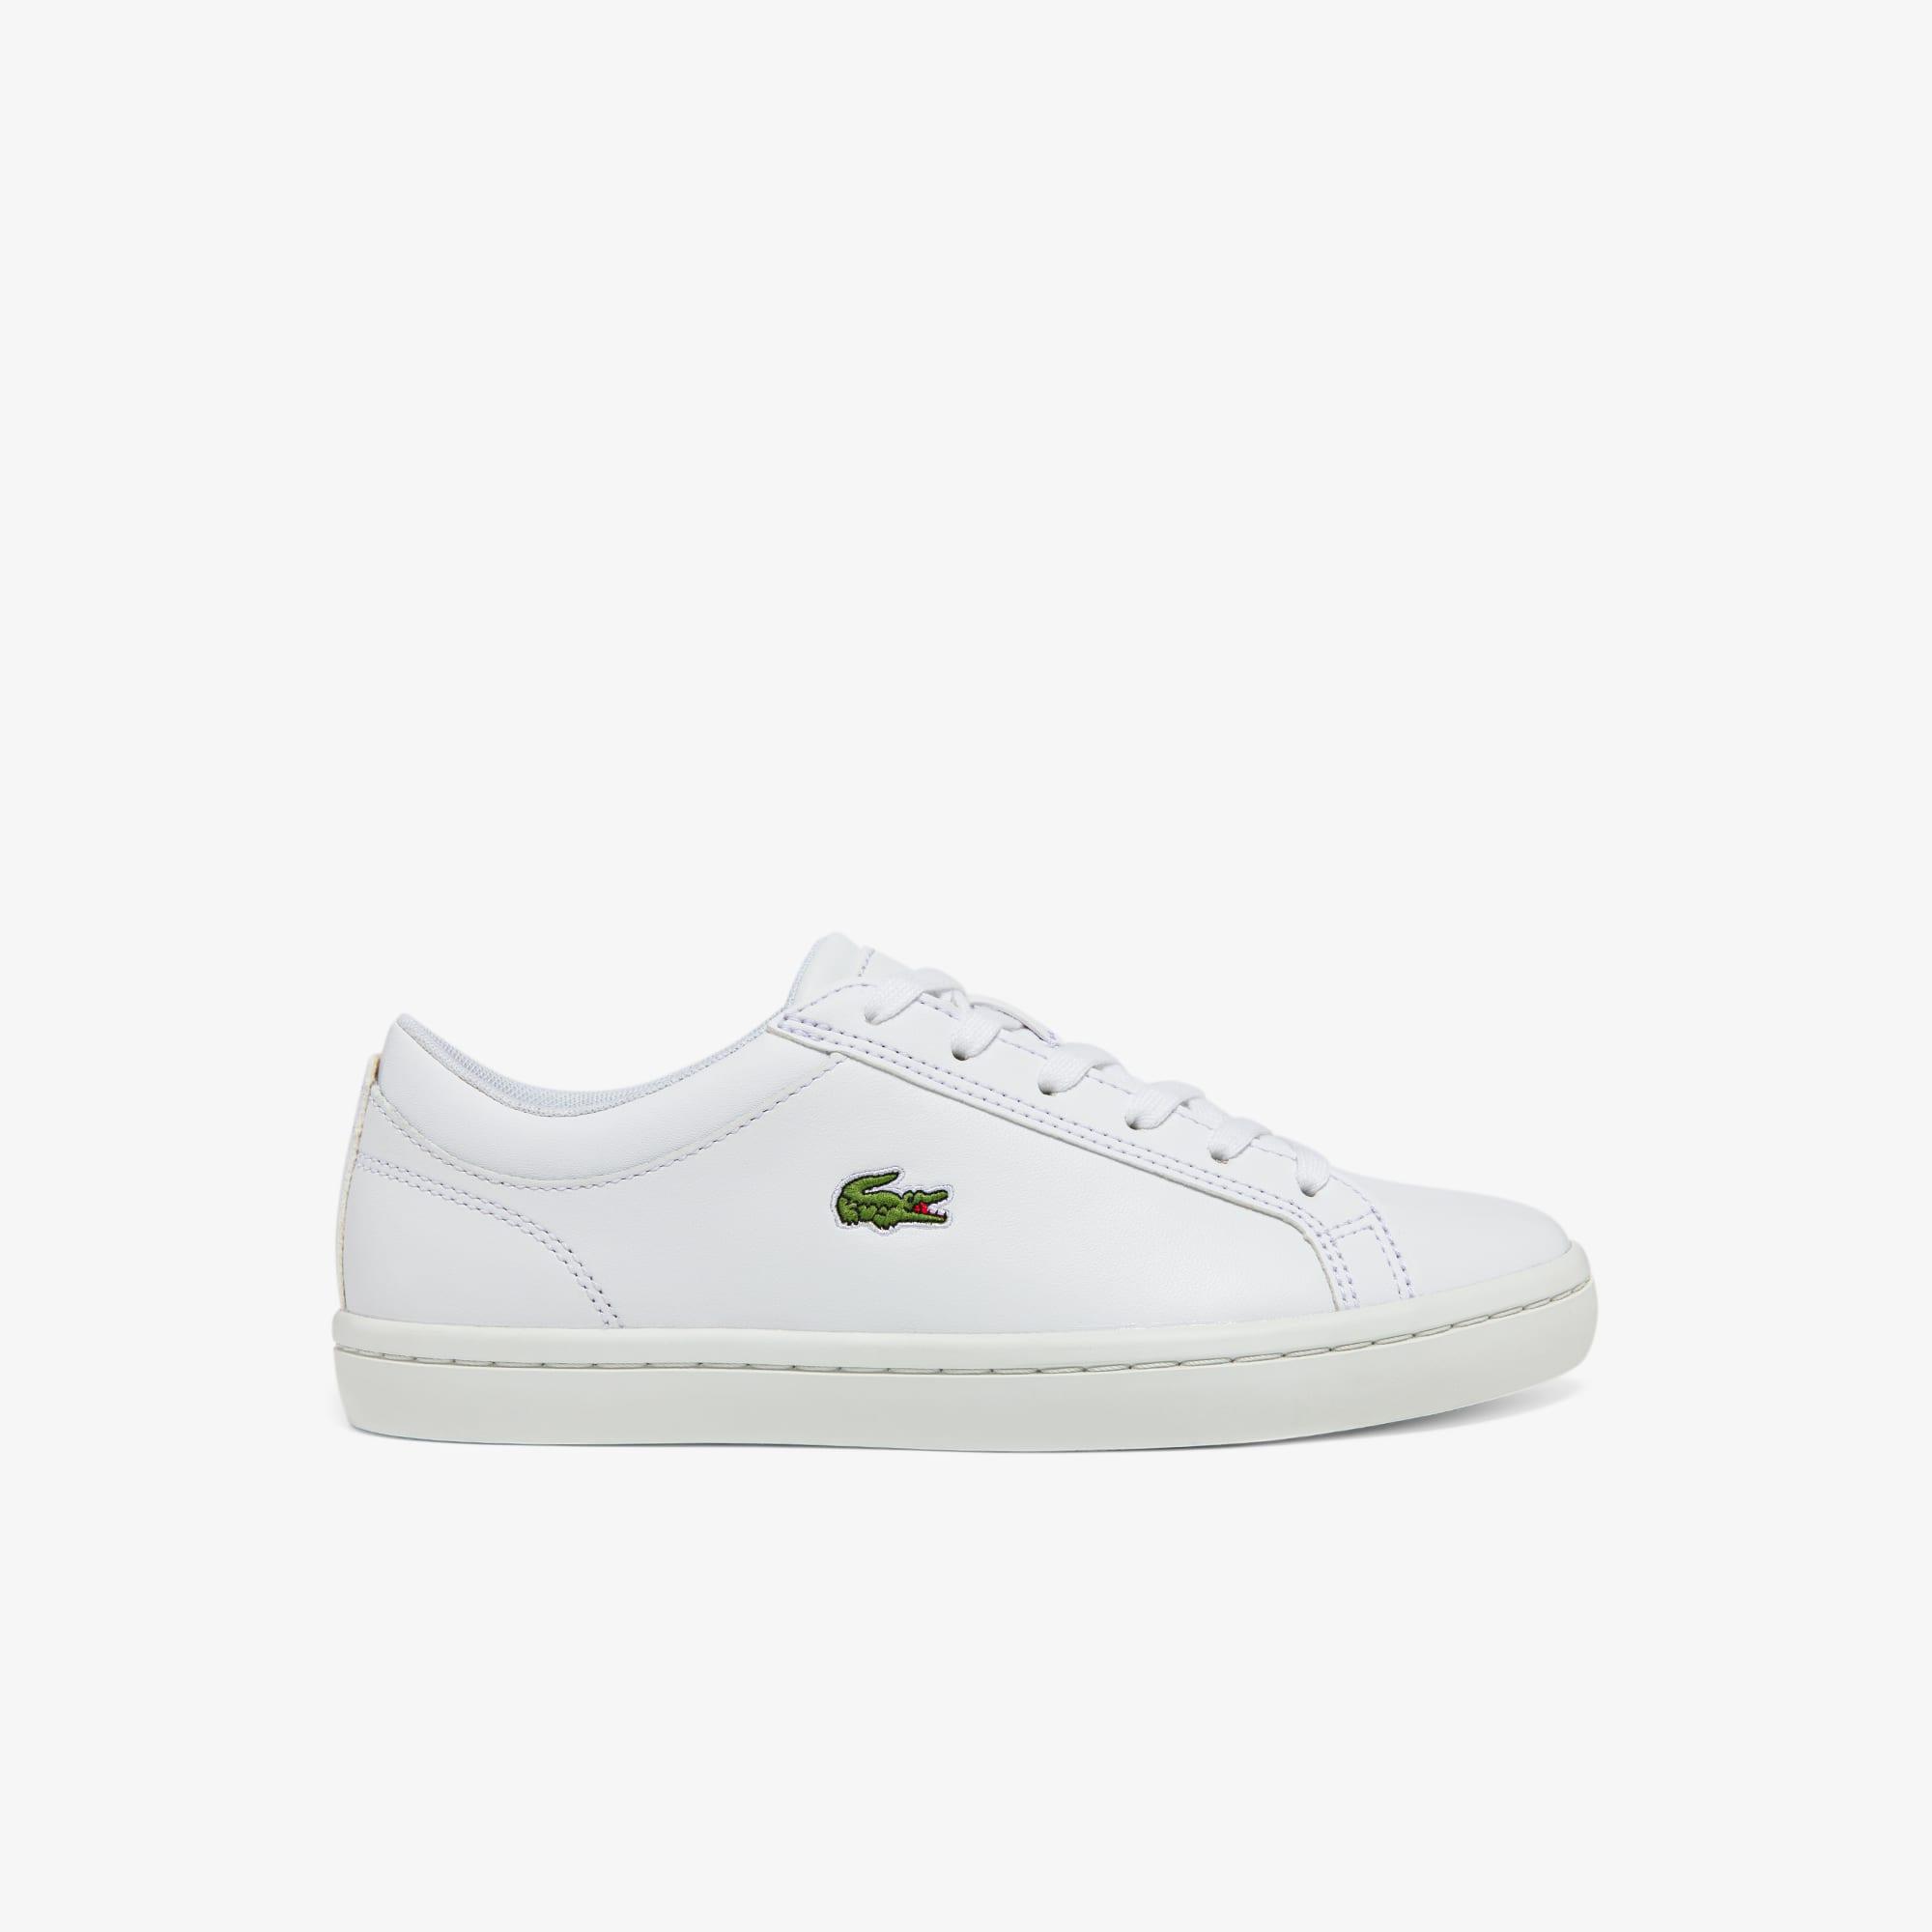 Damen-Sneakers STRAIGHTSET aus Leder und Synthetik